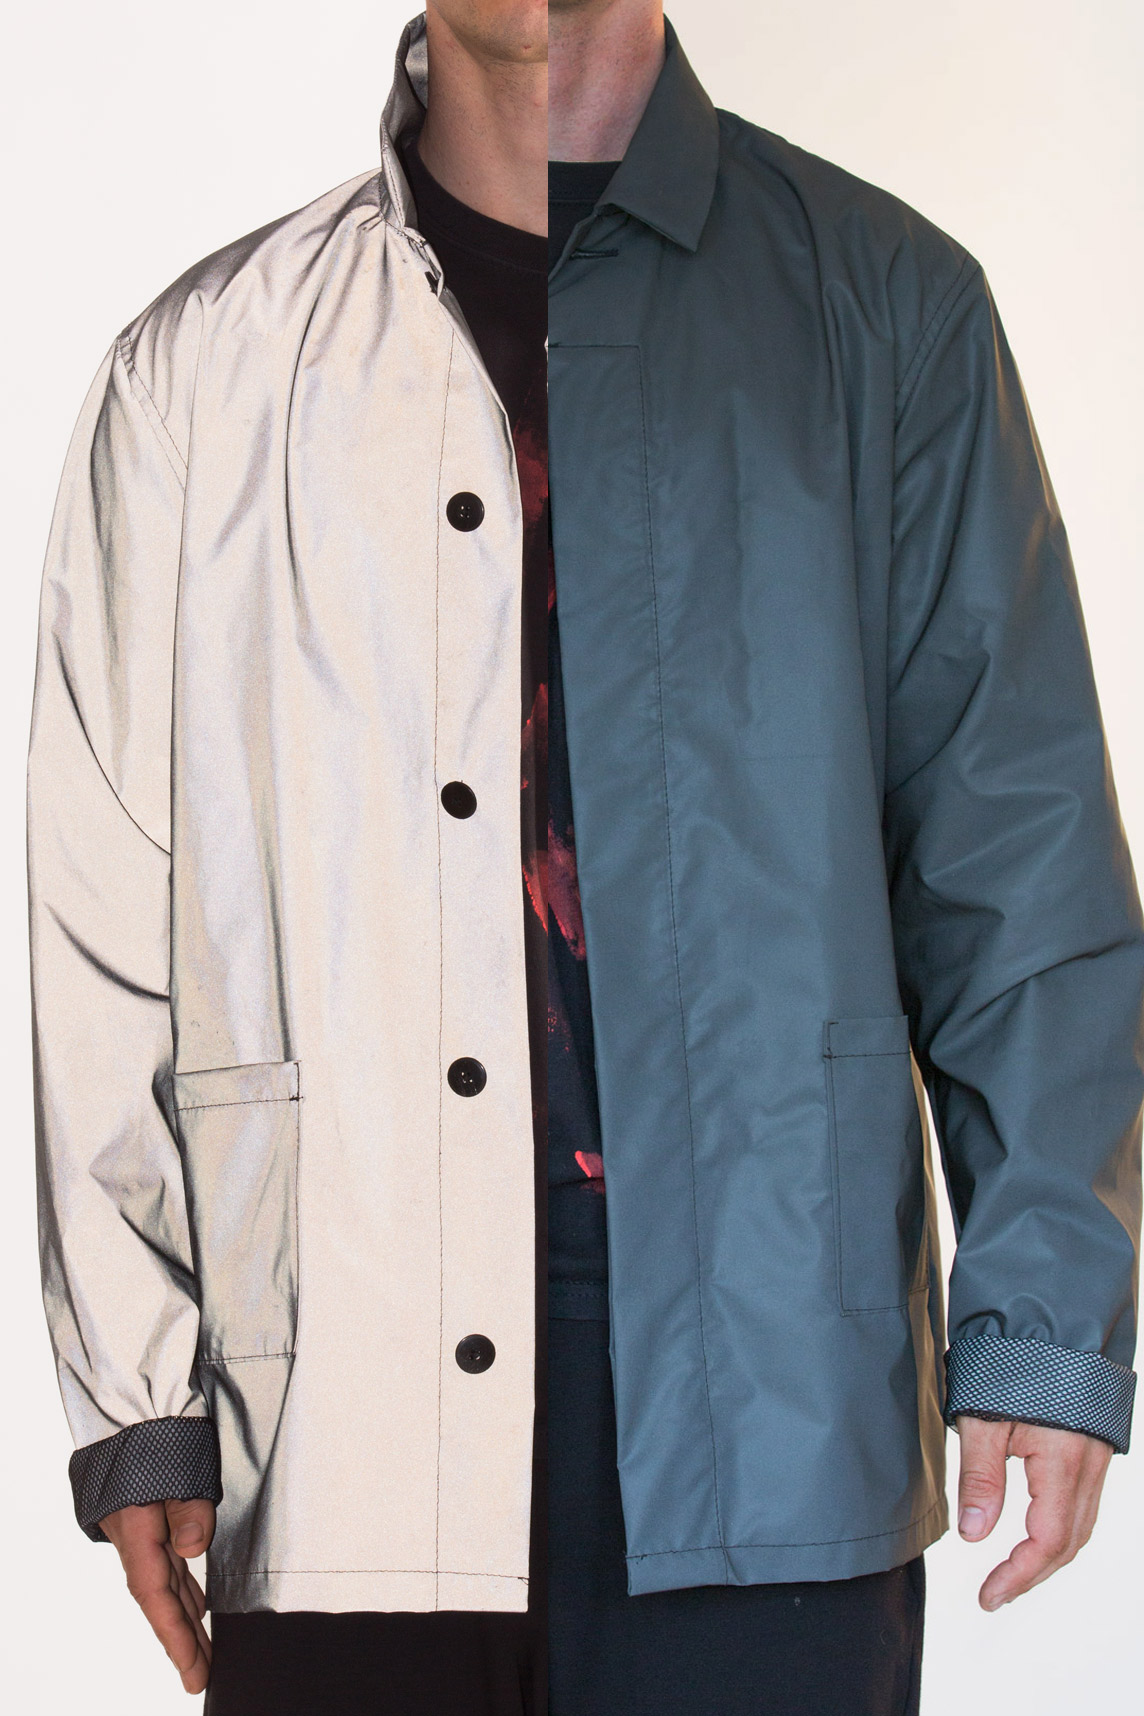 Black Reflective Jacket